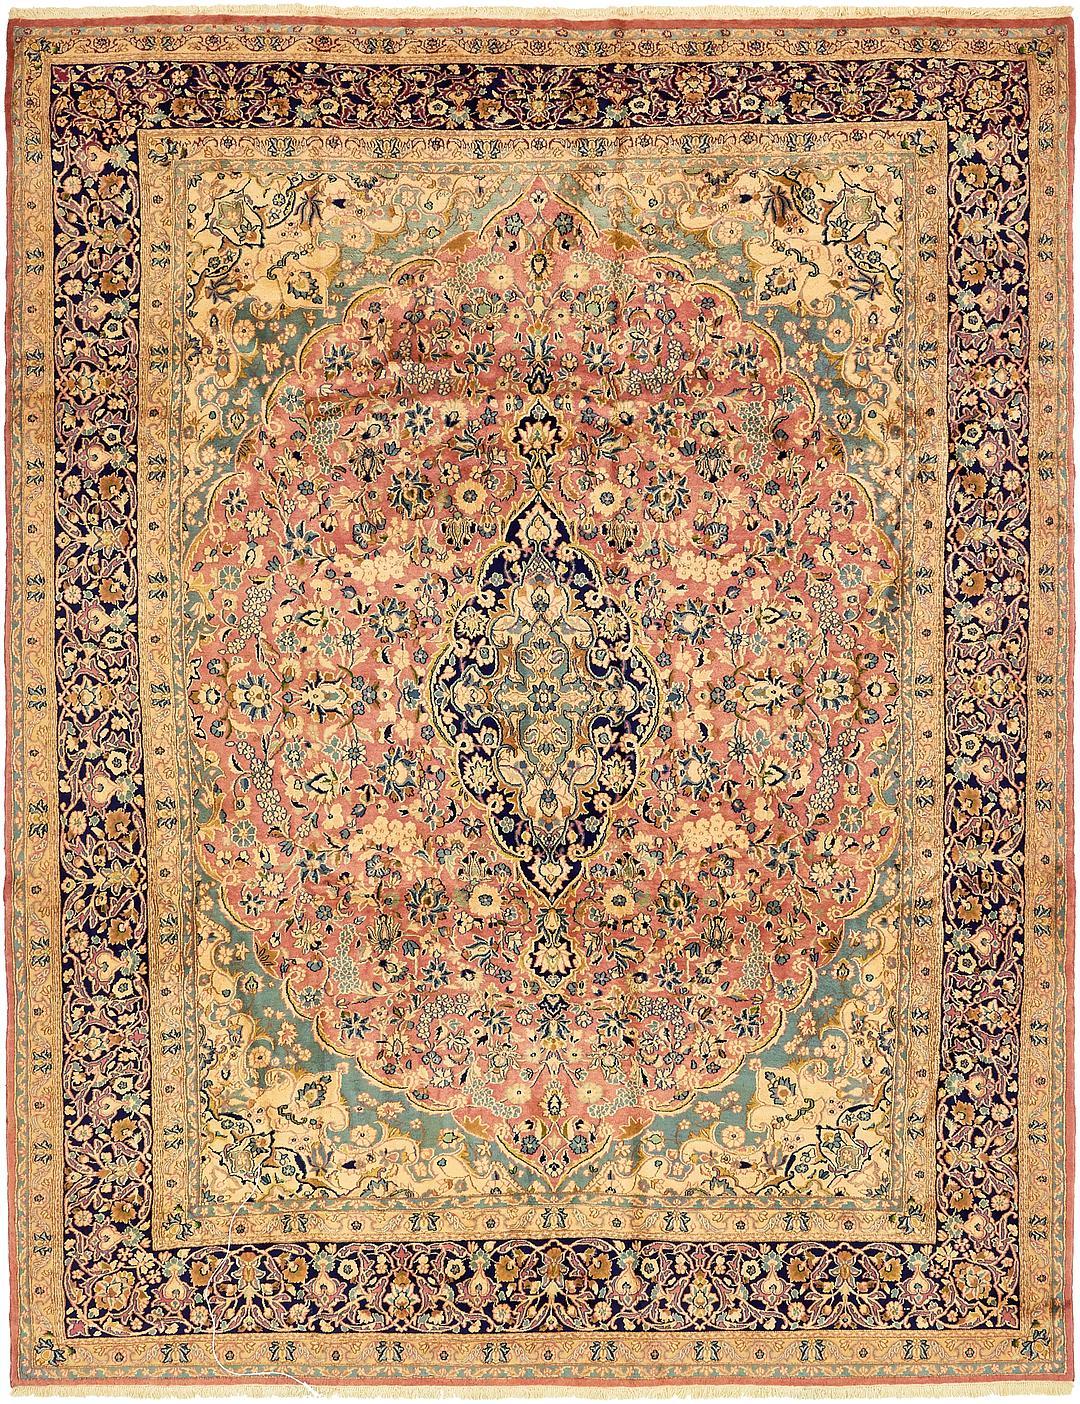 Main Handknotted 9 7 X 12 5 Kerman Persian Rug Photo